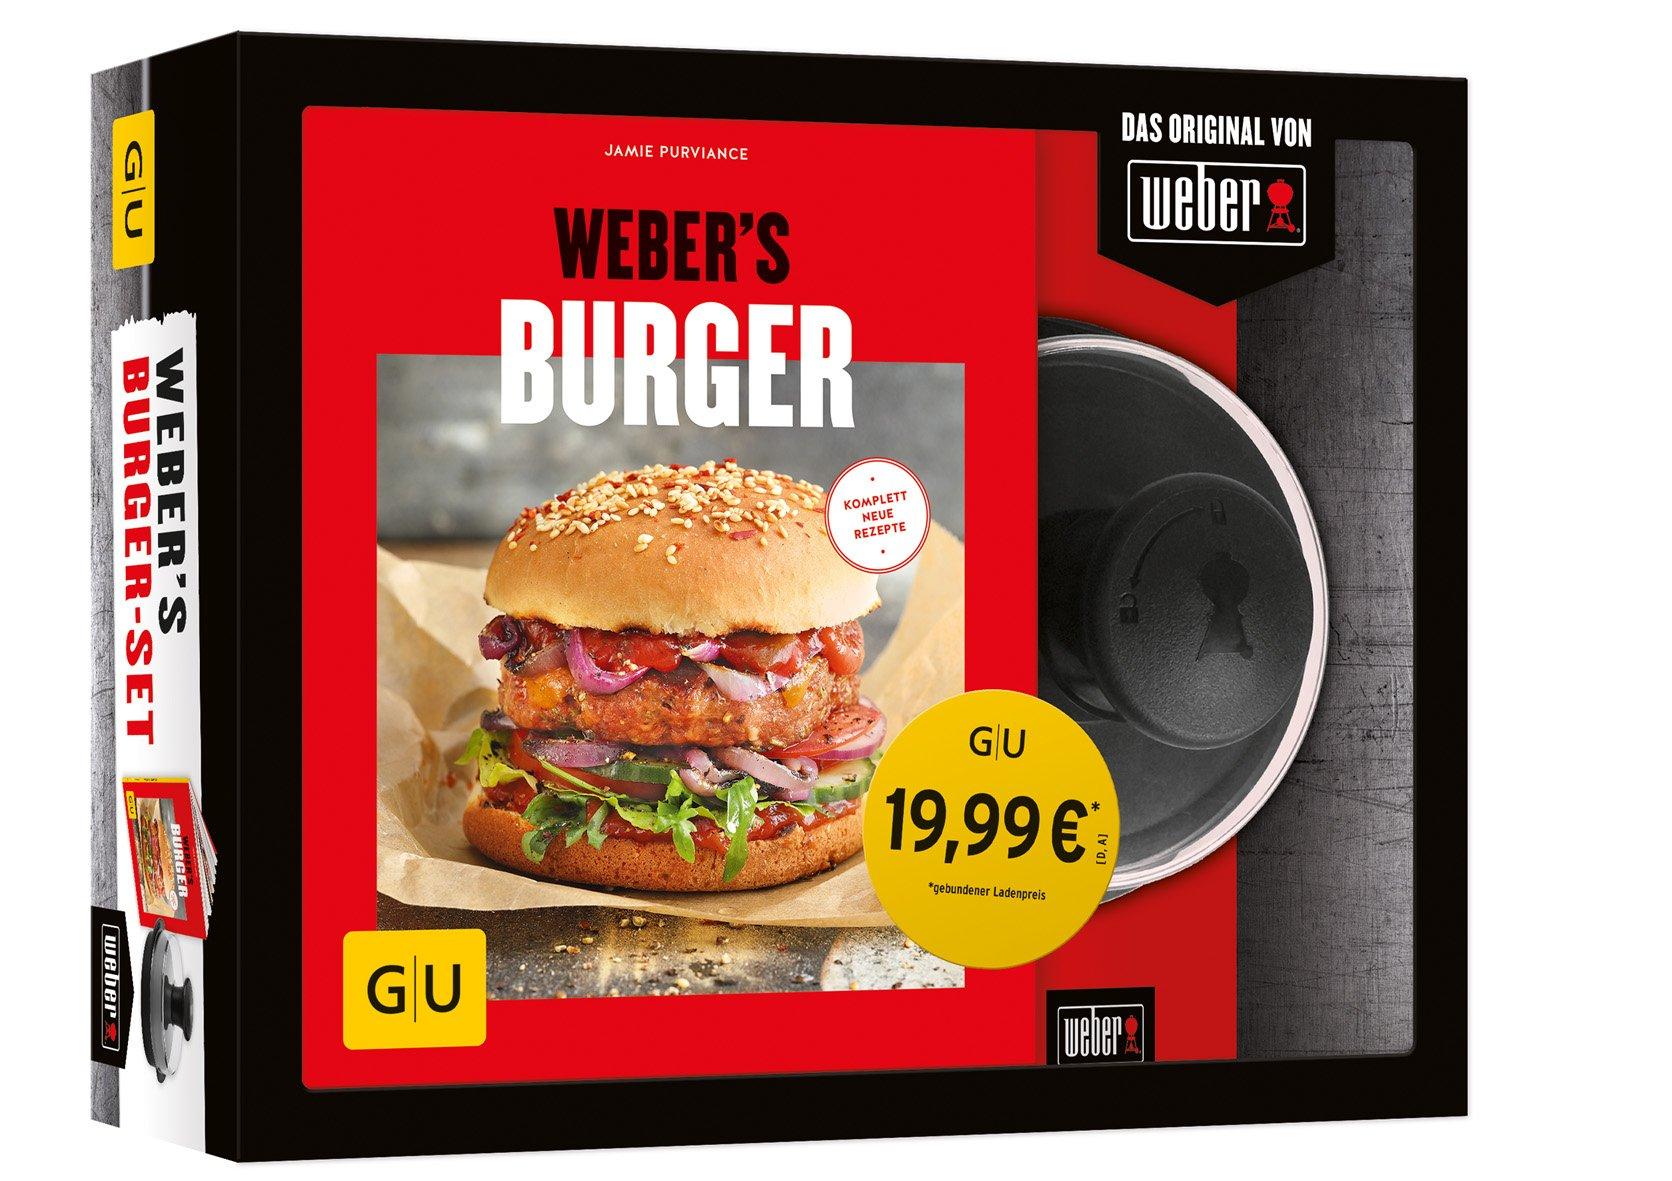 MIB weber Burger